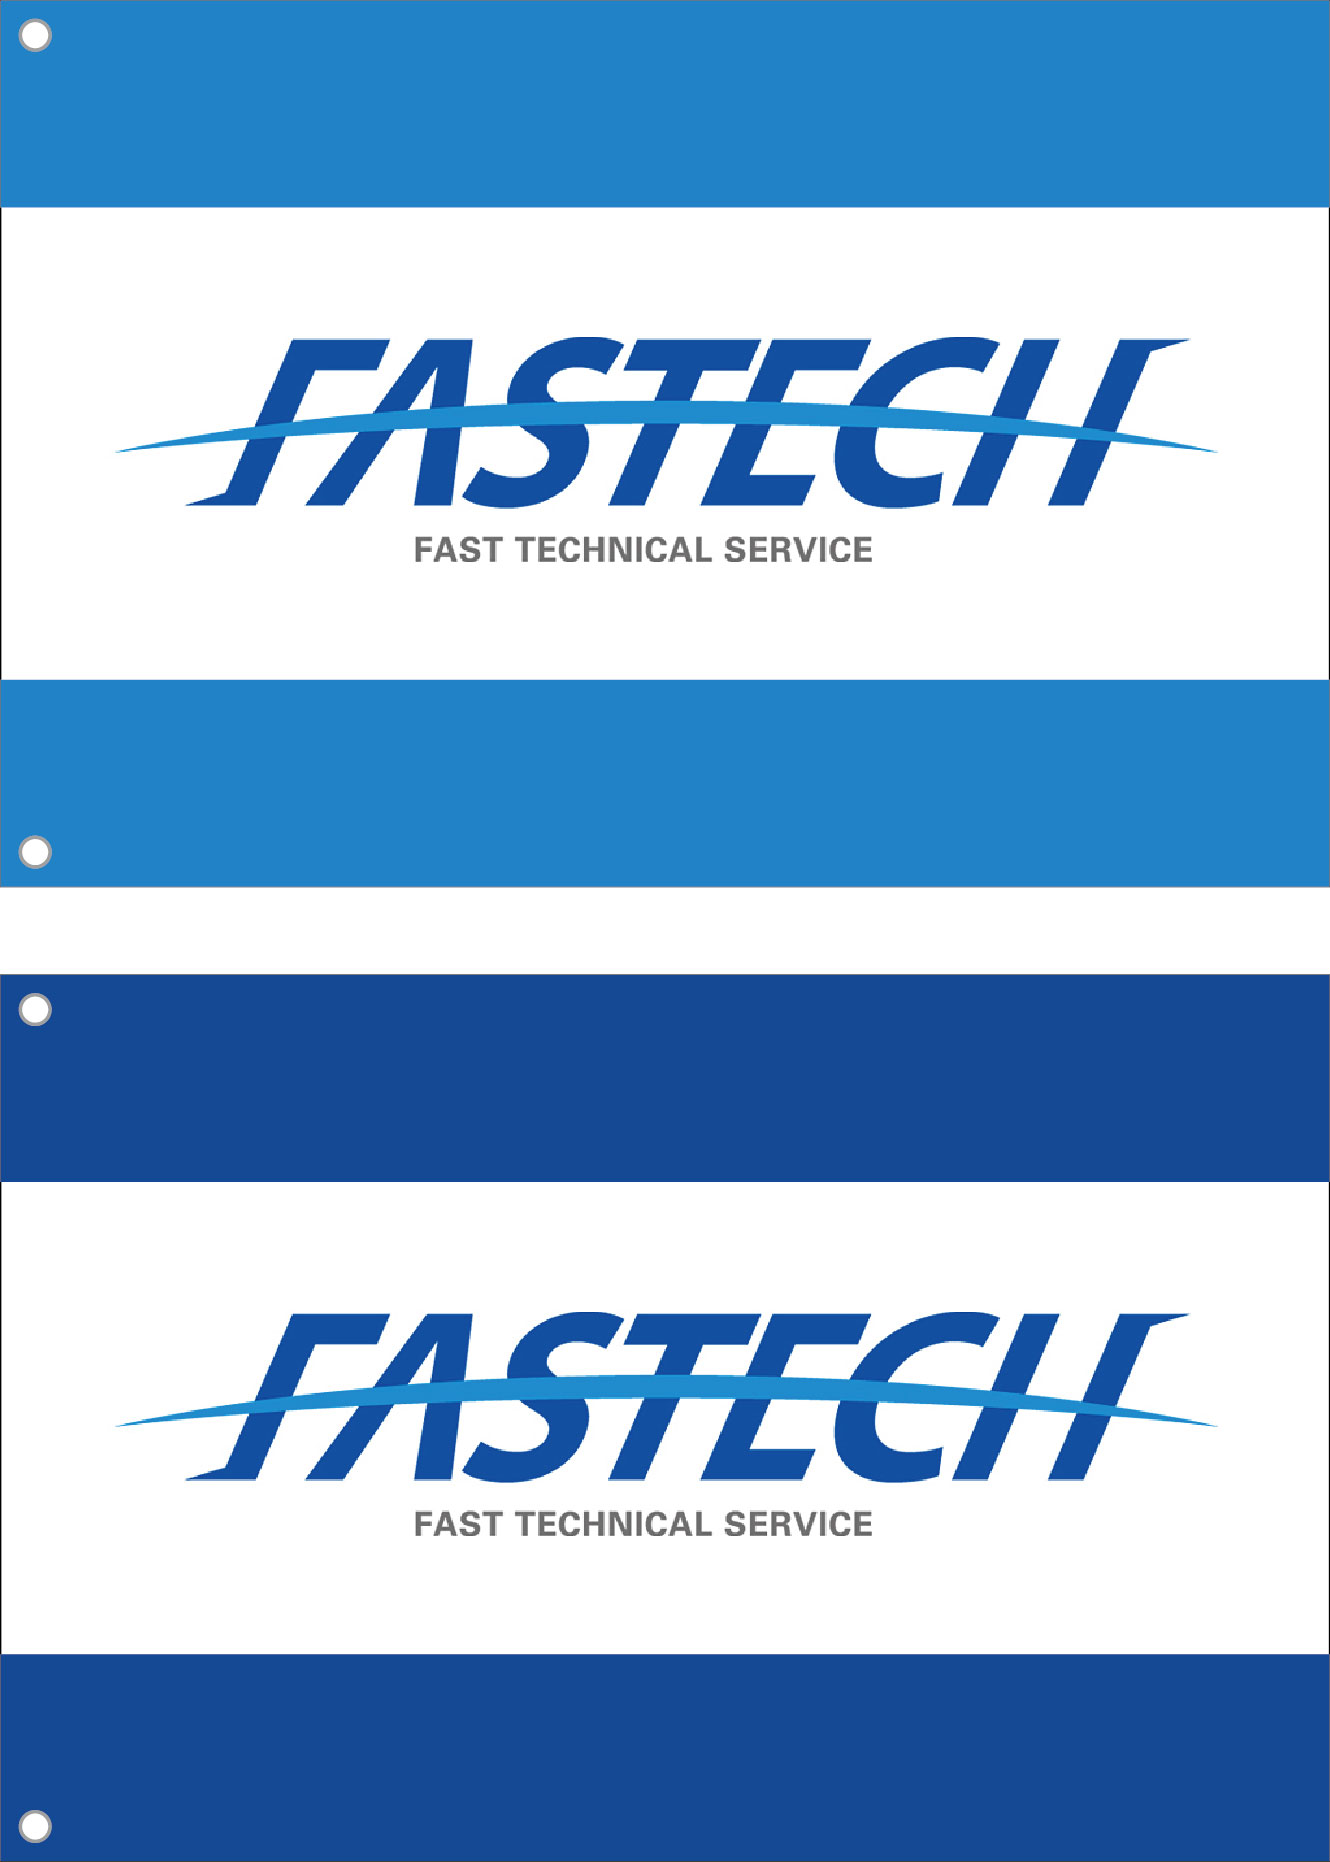 FASTECH 旗原稿